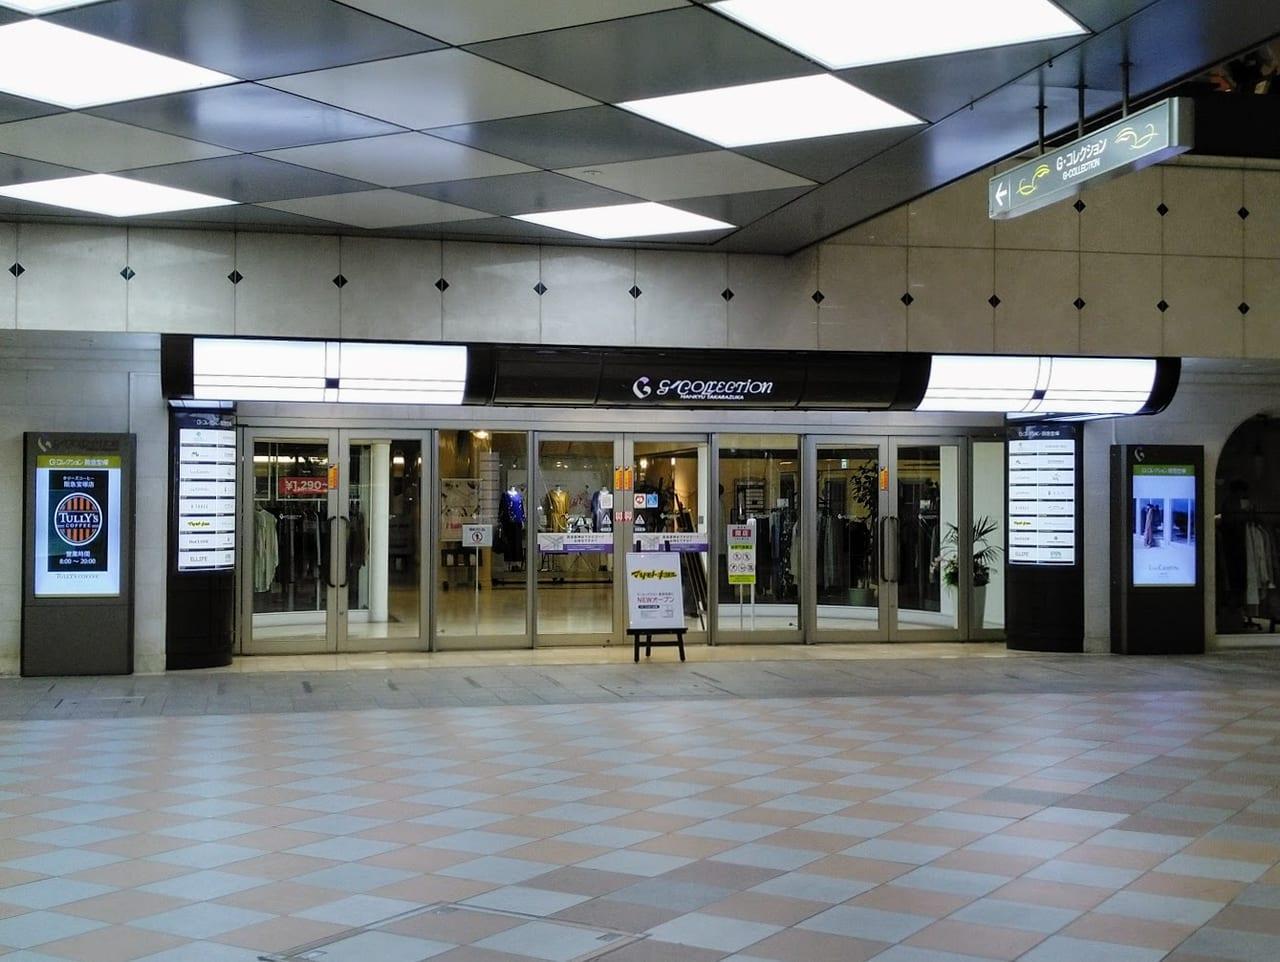 gコレクション阪急宝塚にマツモトキヨシがオープン